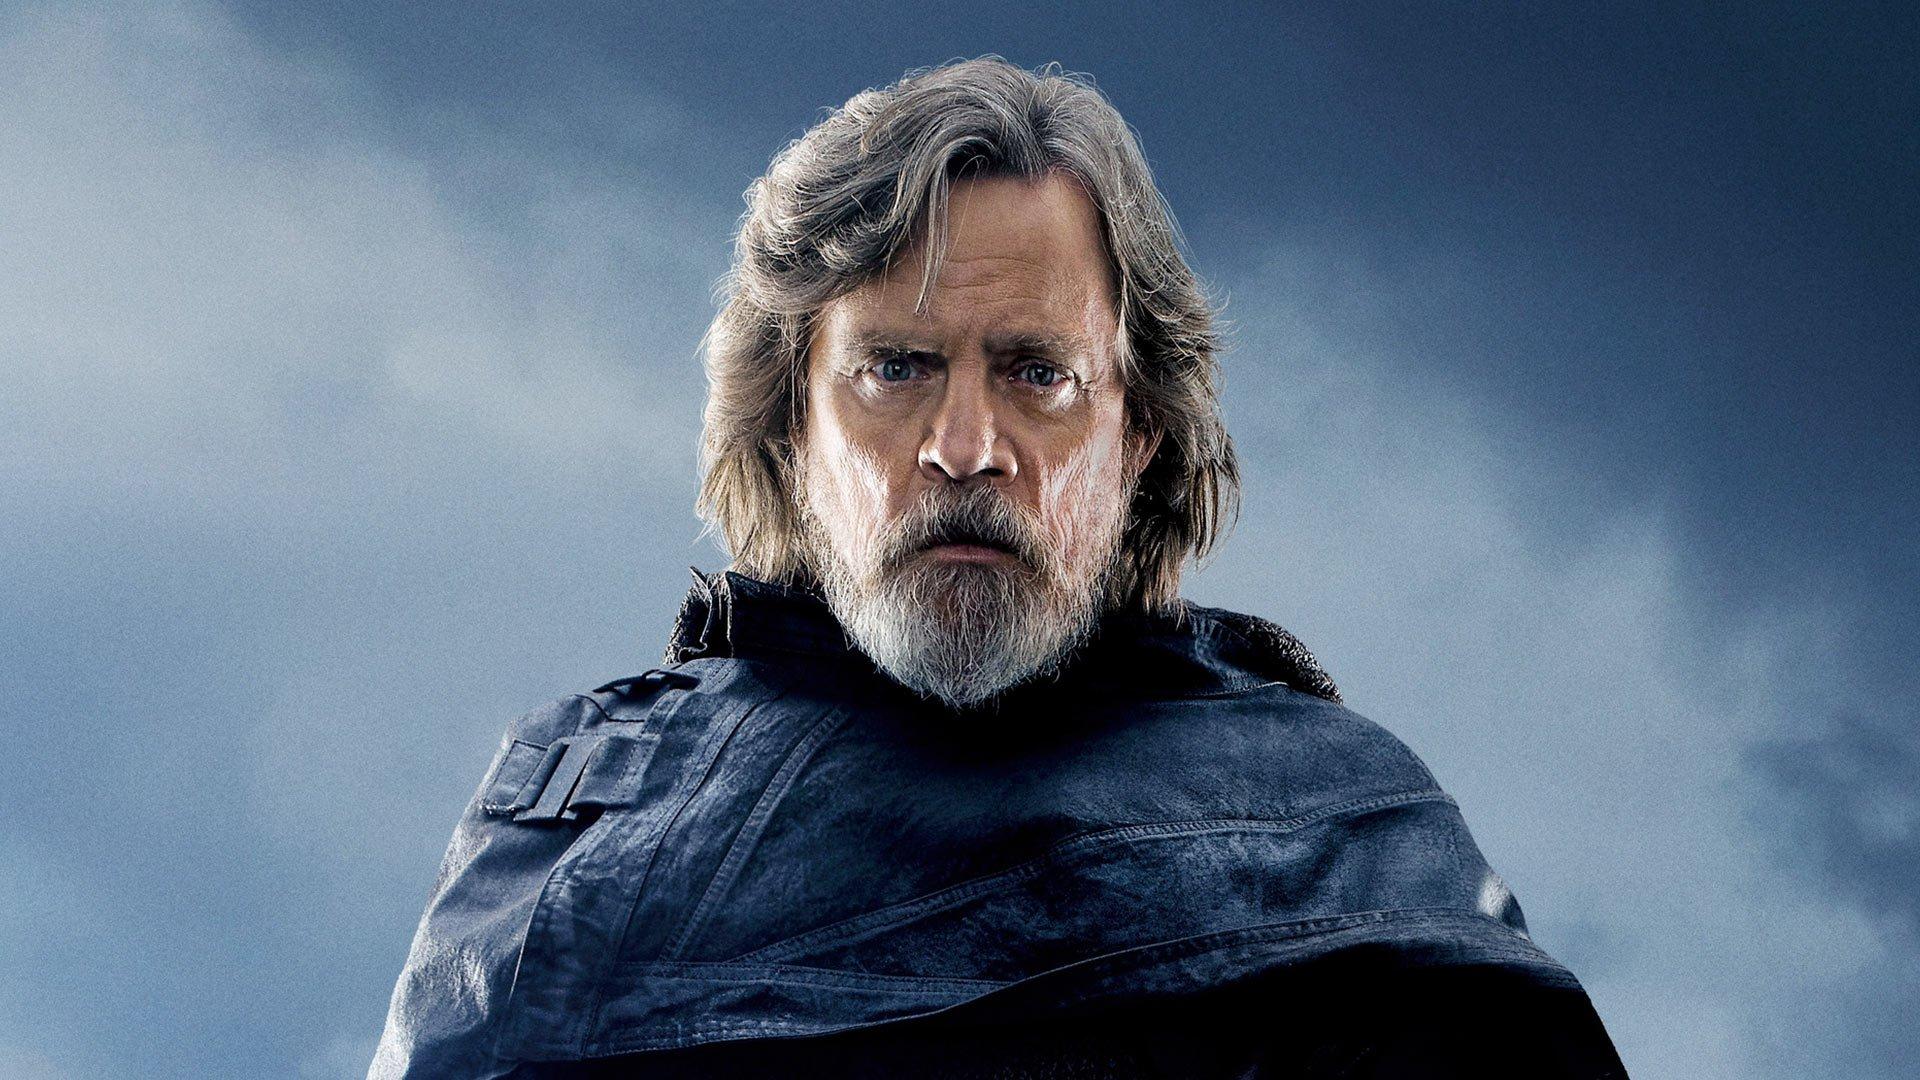 Luke Skywalker Wallpaper Hd 2019 Supertab Themes